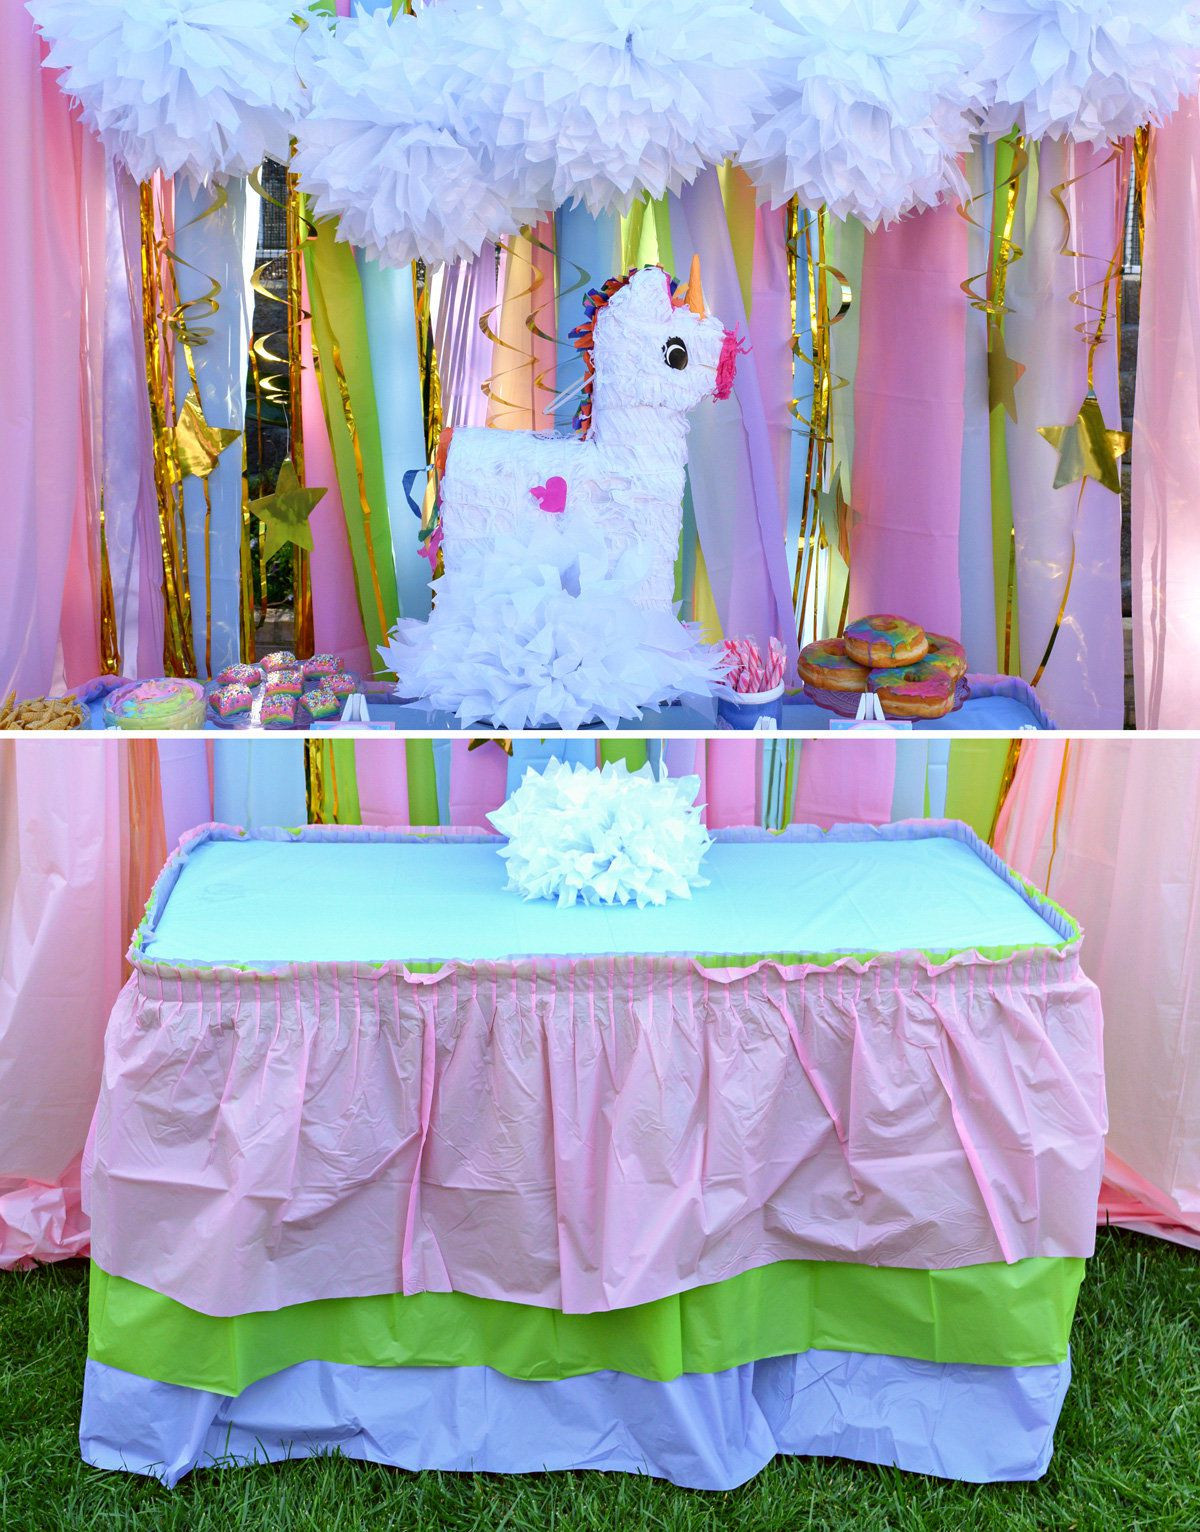 Unicorn Party Table Ideas  Unicorn Party Ideas